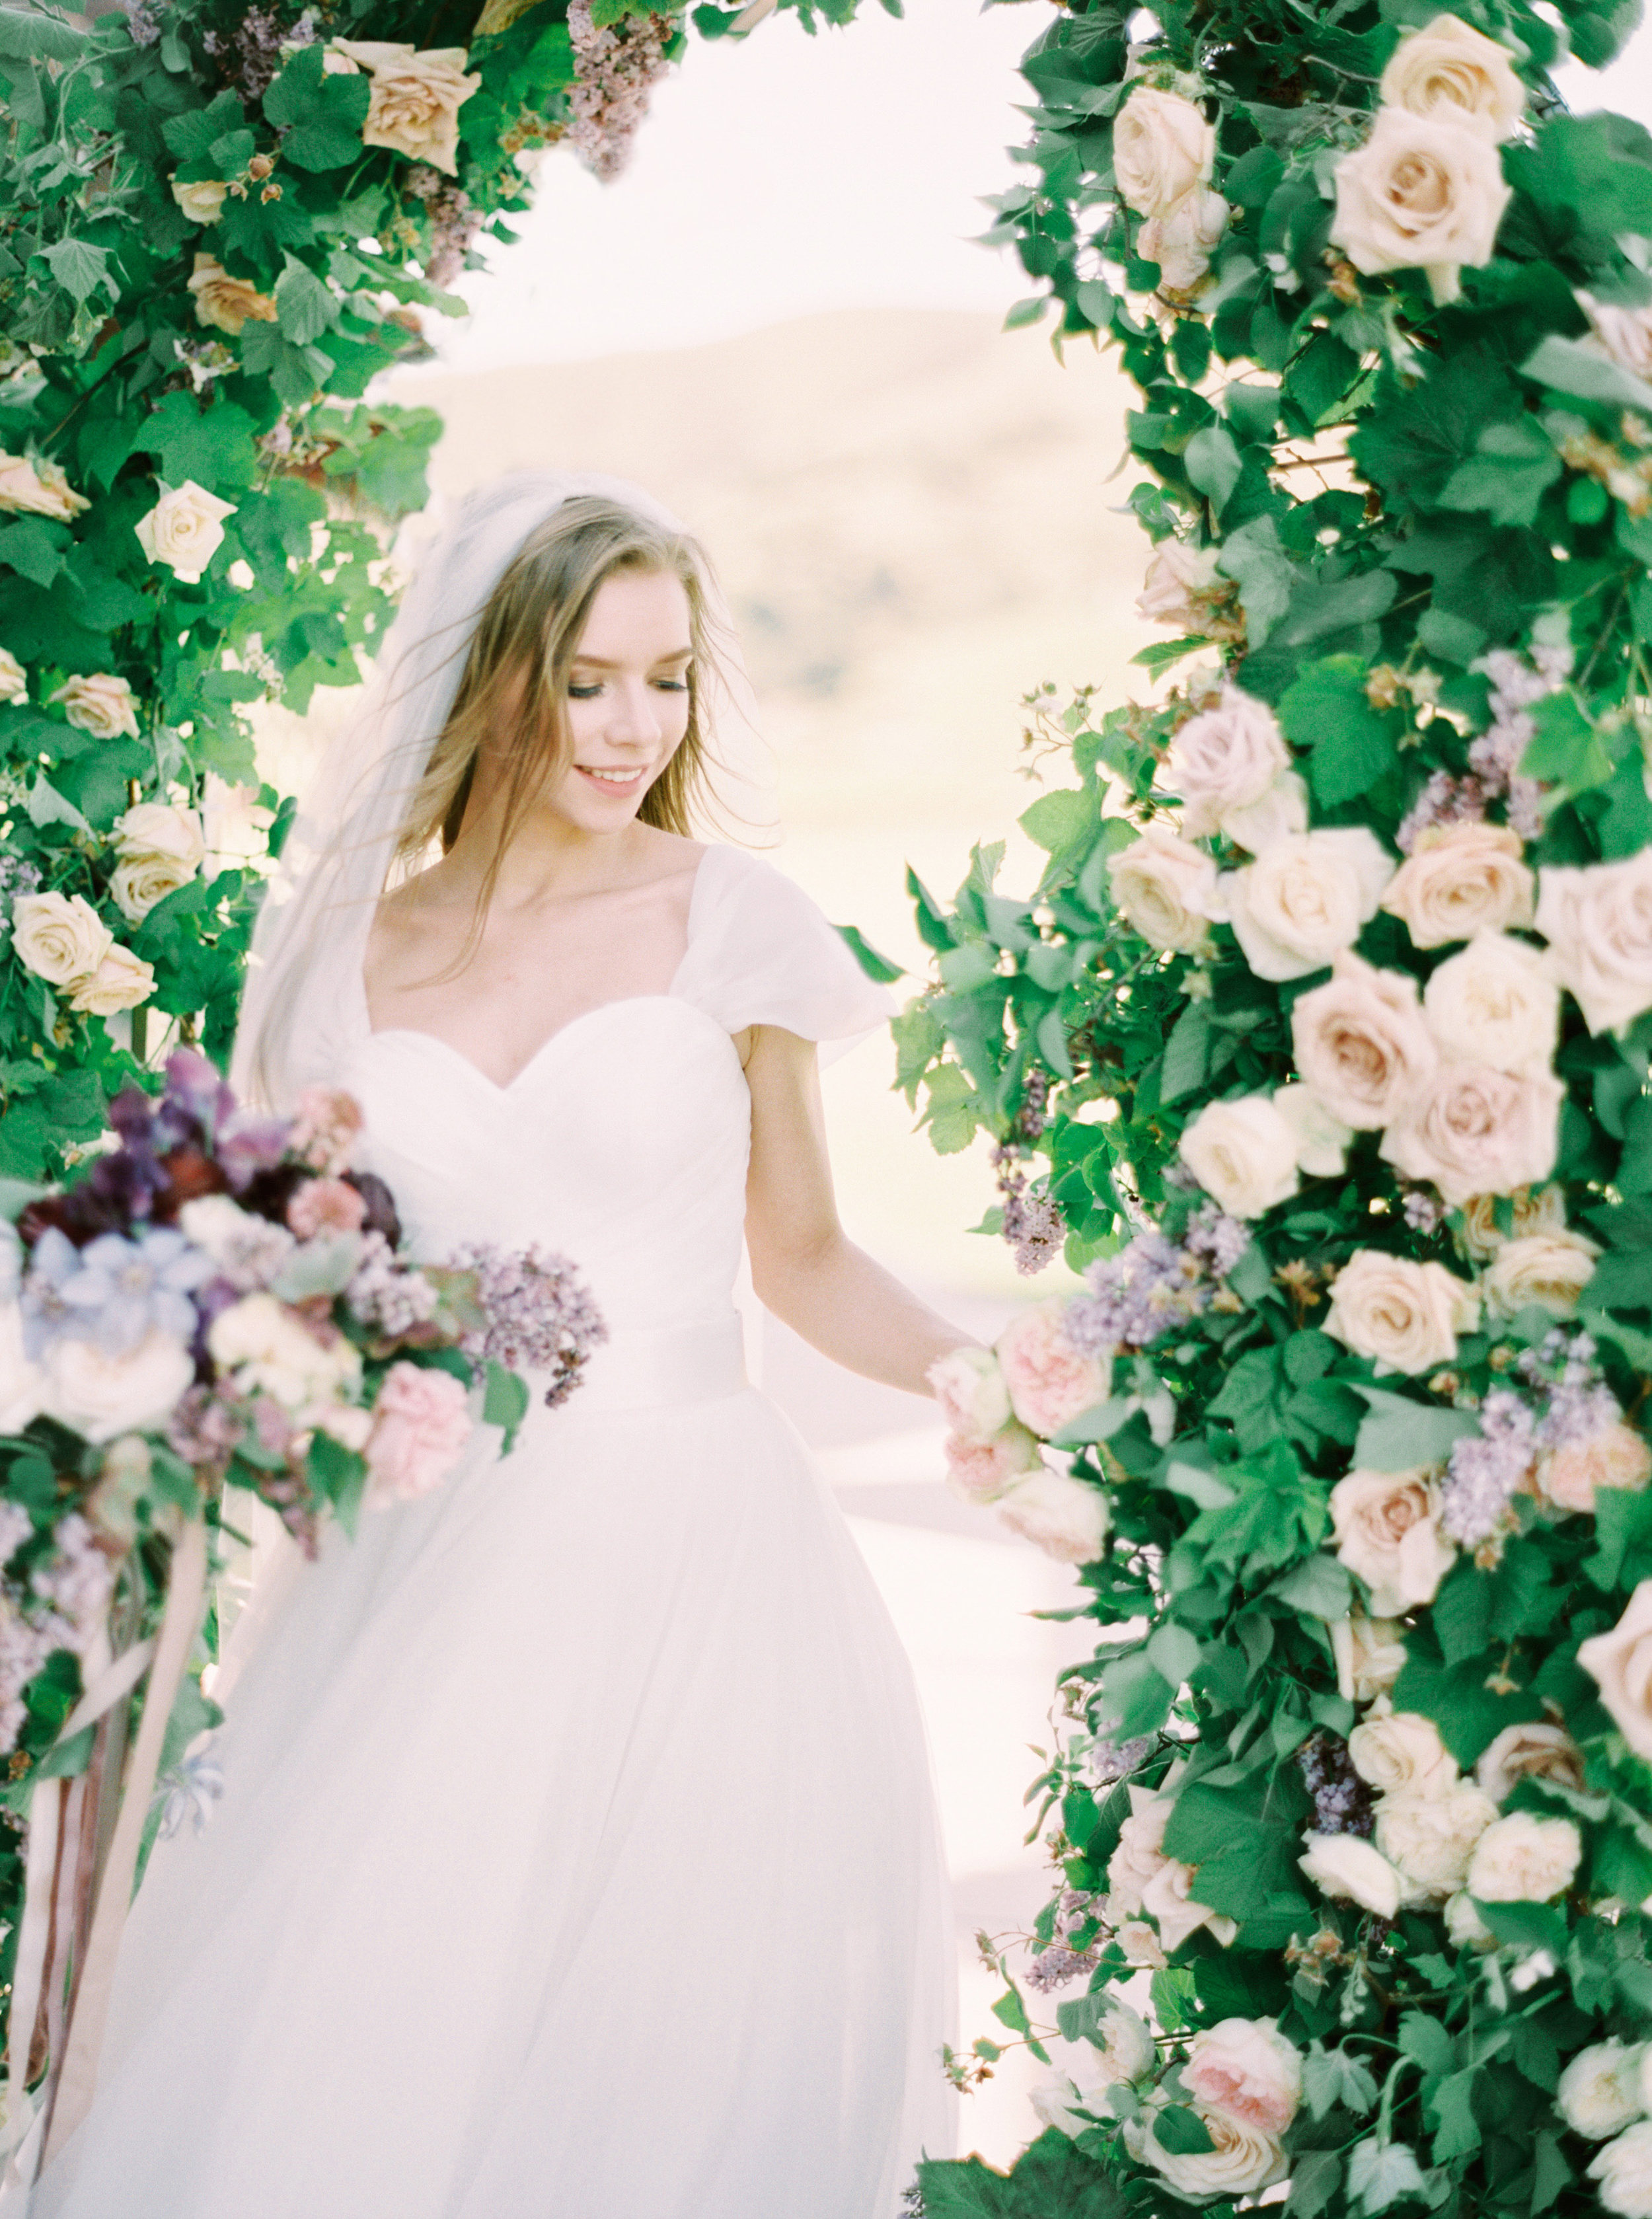 This-Love-of-Yours-Kirigin-Cellars-Flower-Arch-Styled-Shoot-117.jpg